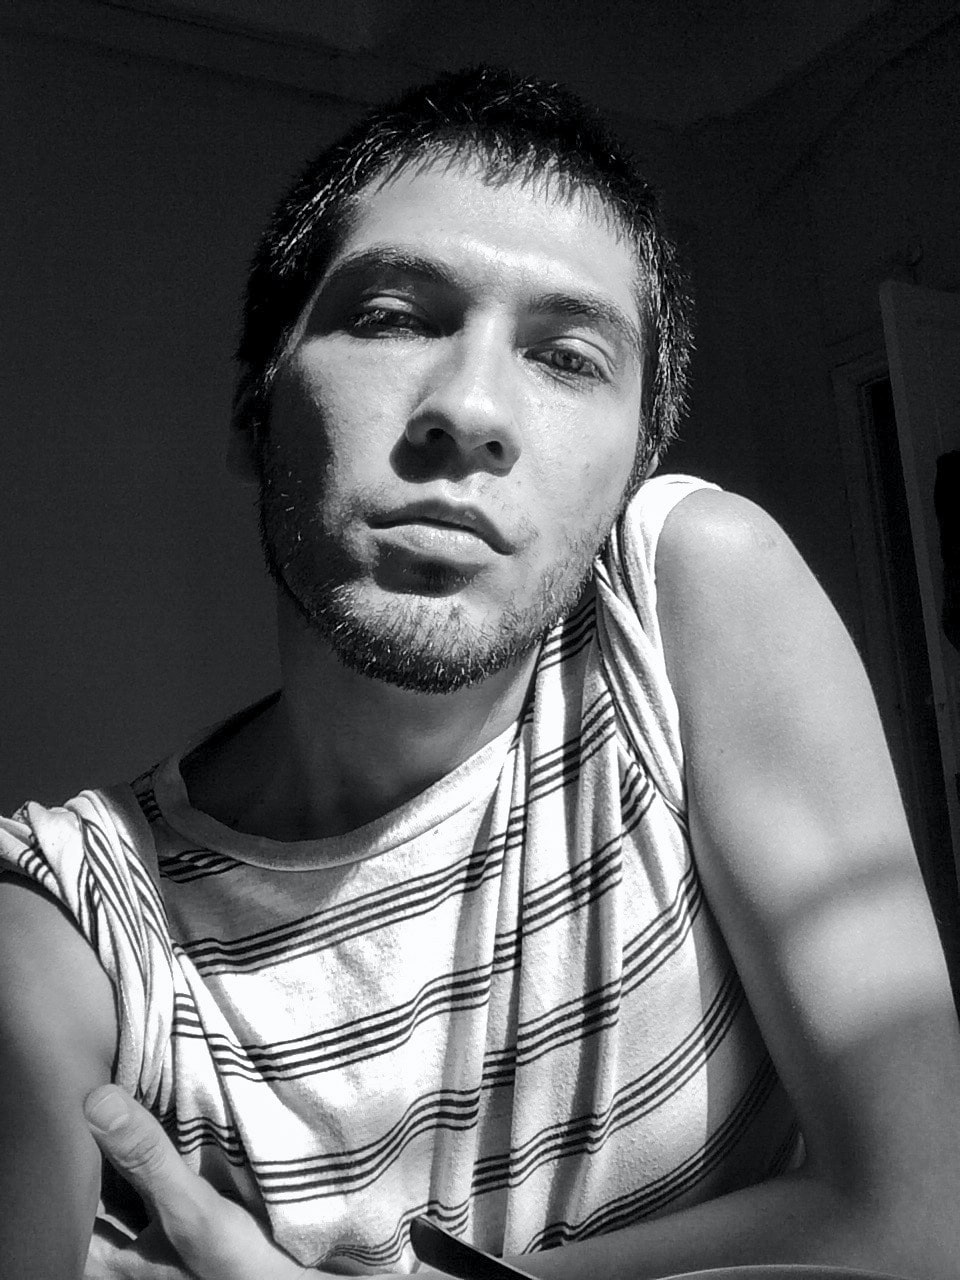 Go to Juan Pablo Ahumada's profile